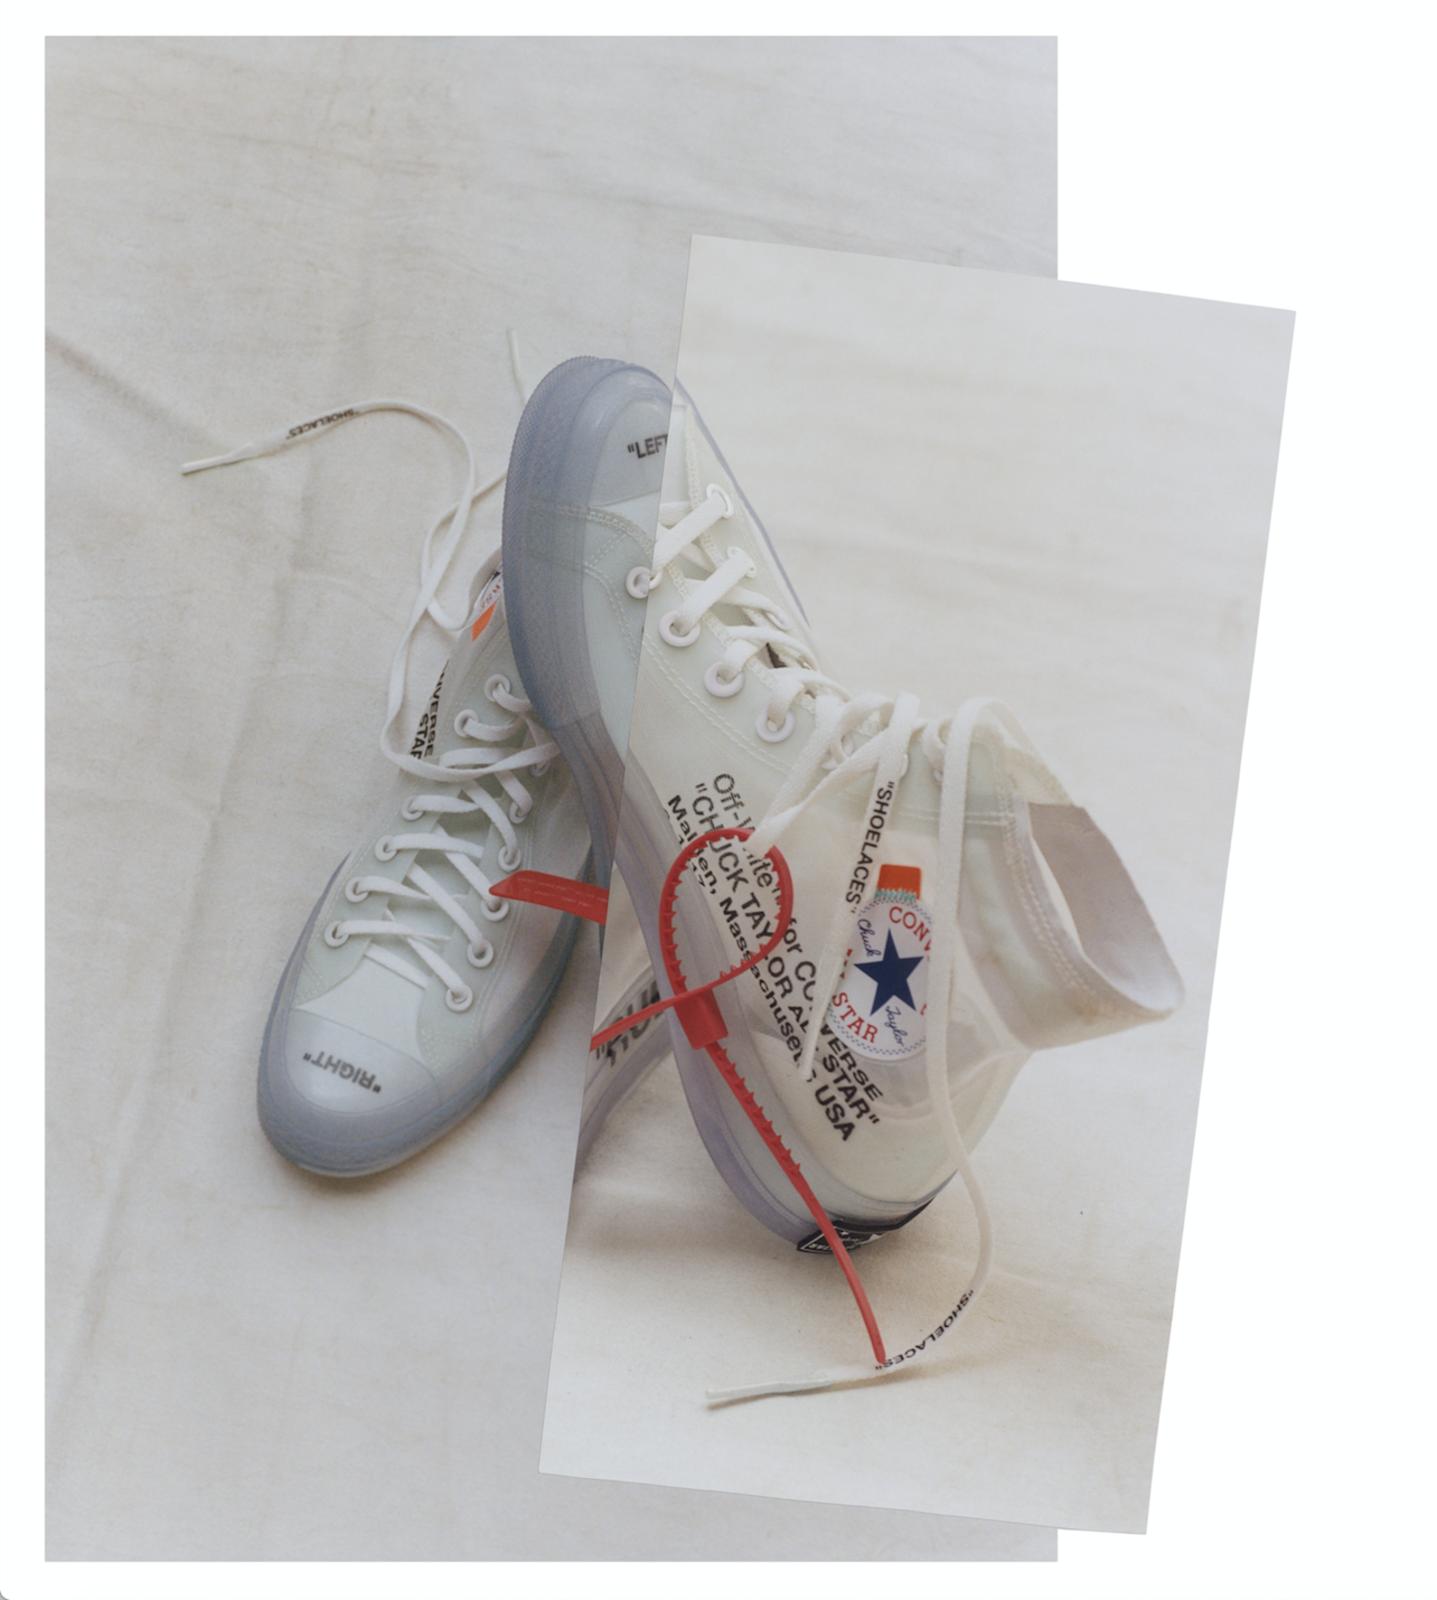 Converse x Virgil Abloh Chuck 70 - Nike